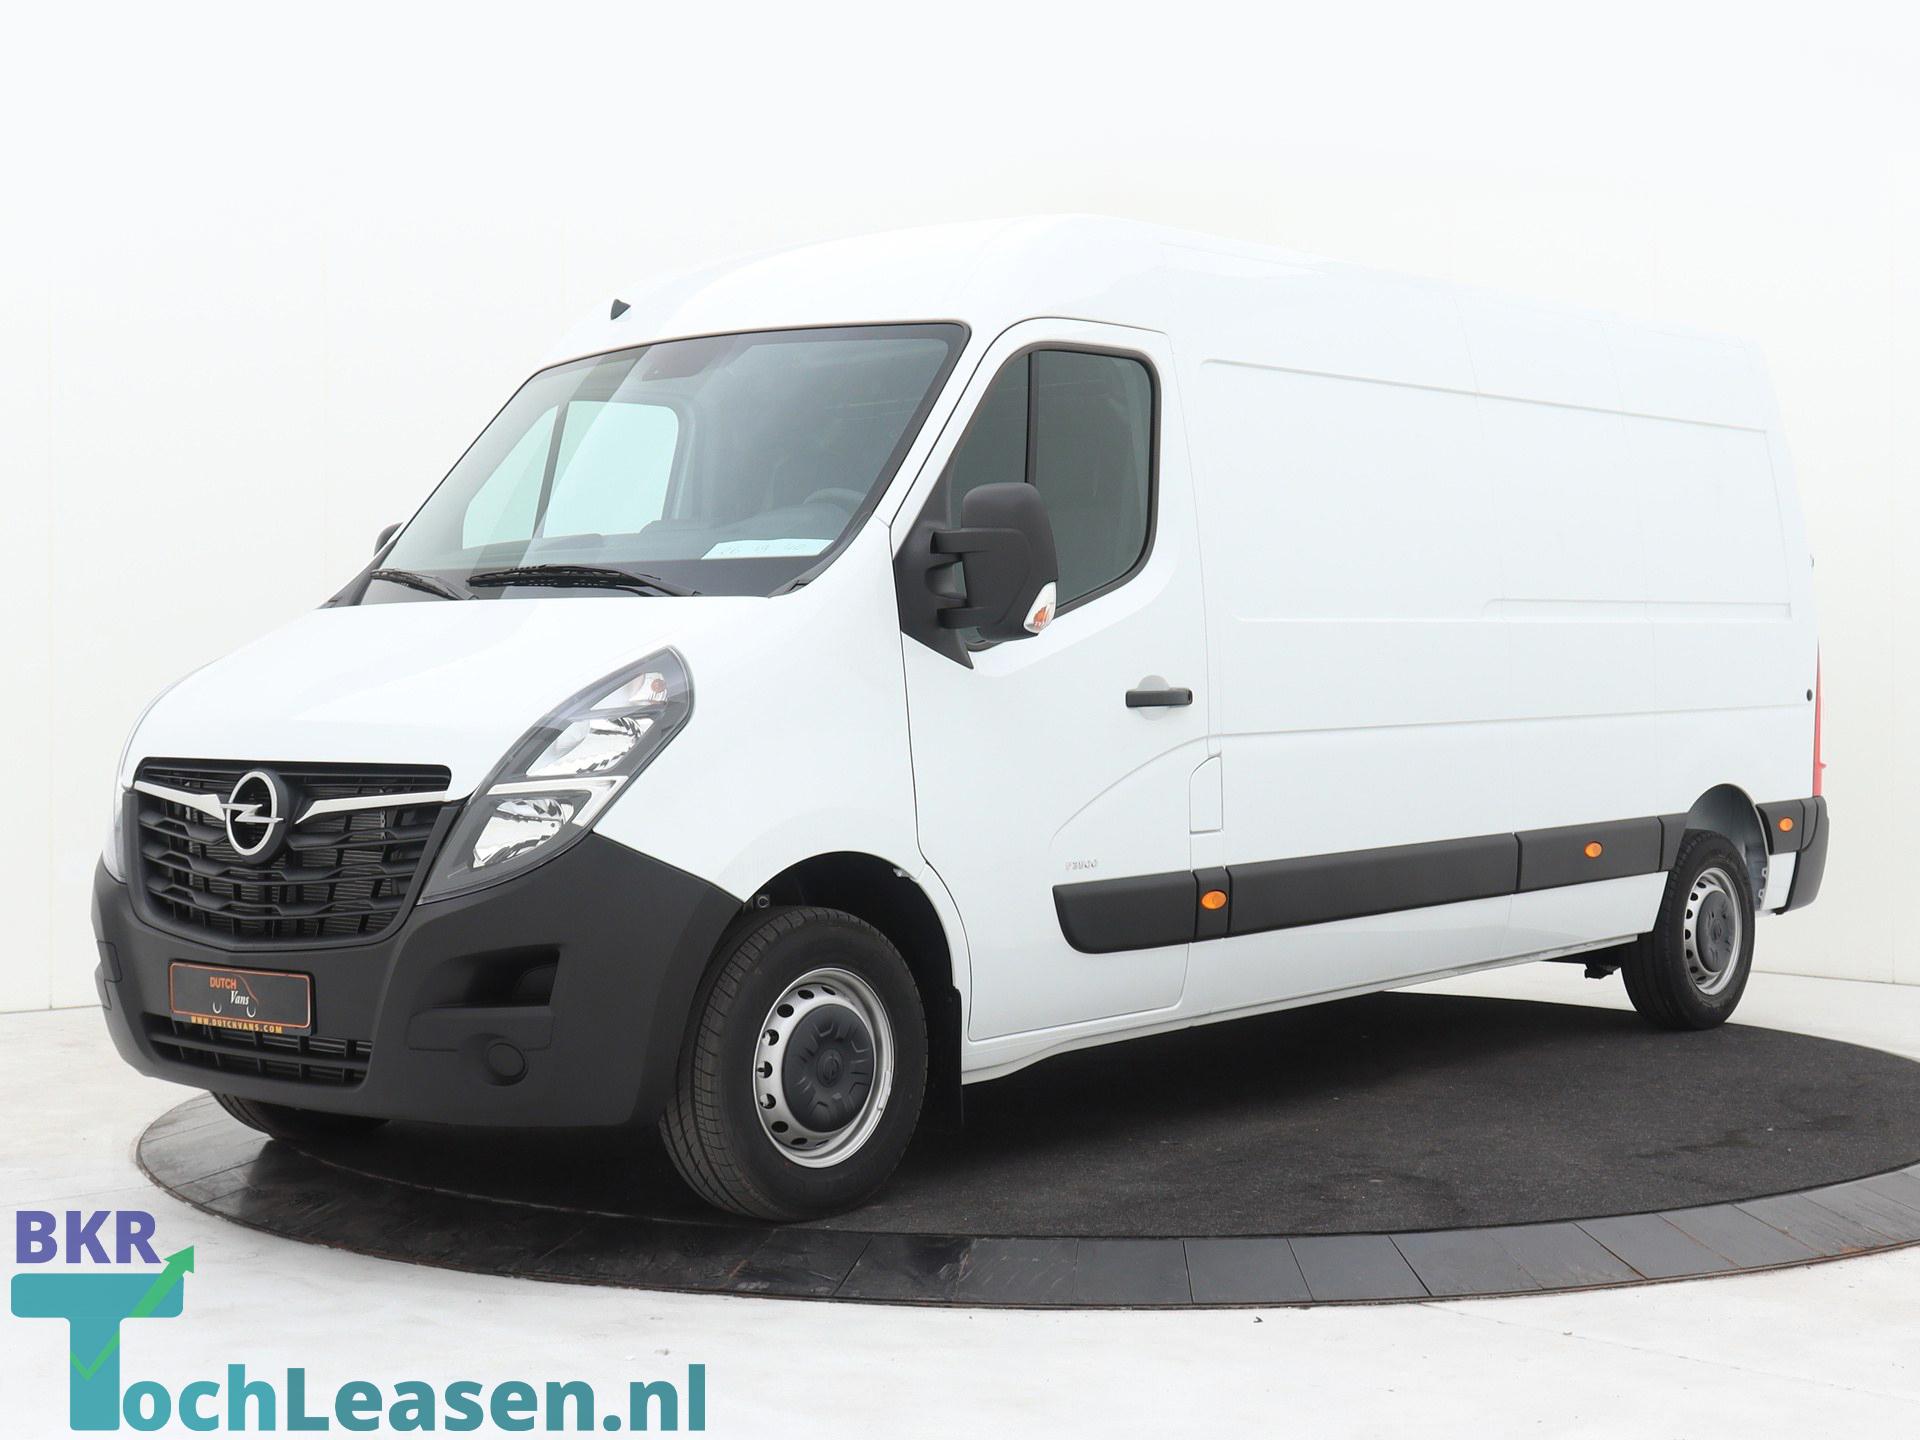 BKRTochLeasen.nl - Opel Movano - L3H2 - wit 18